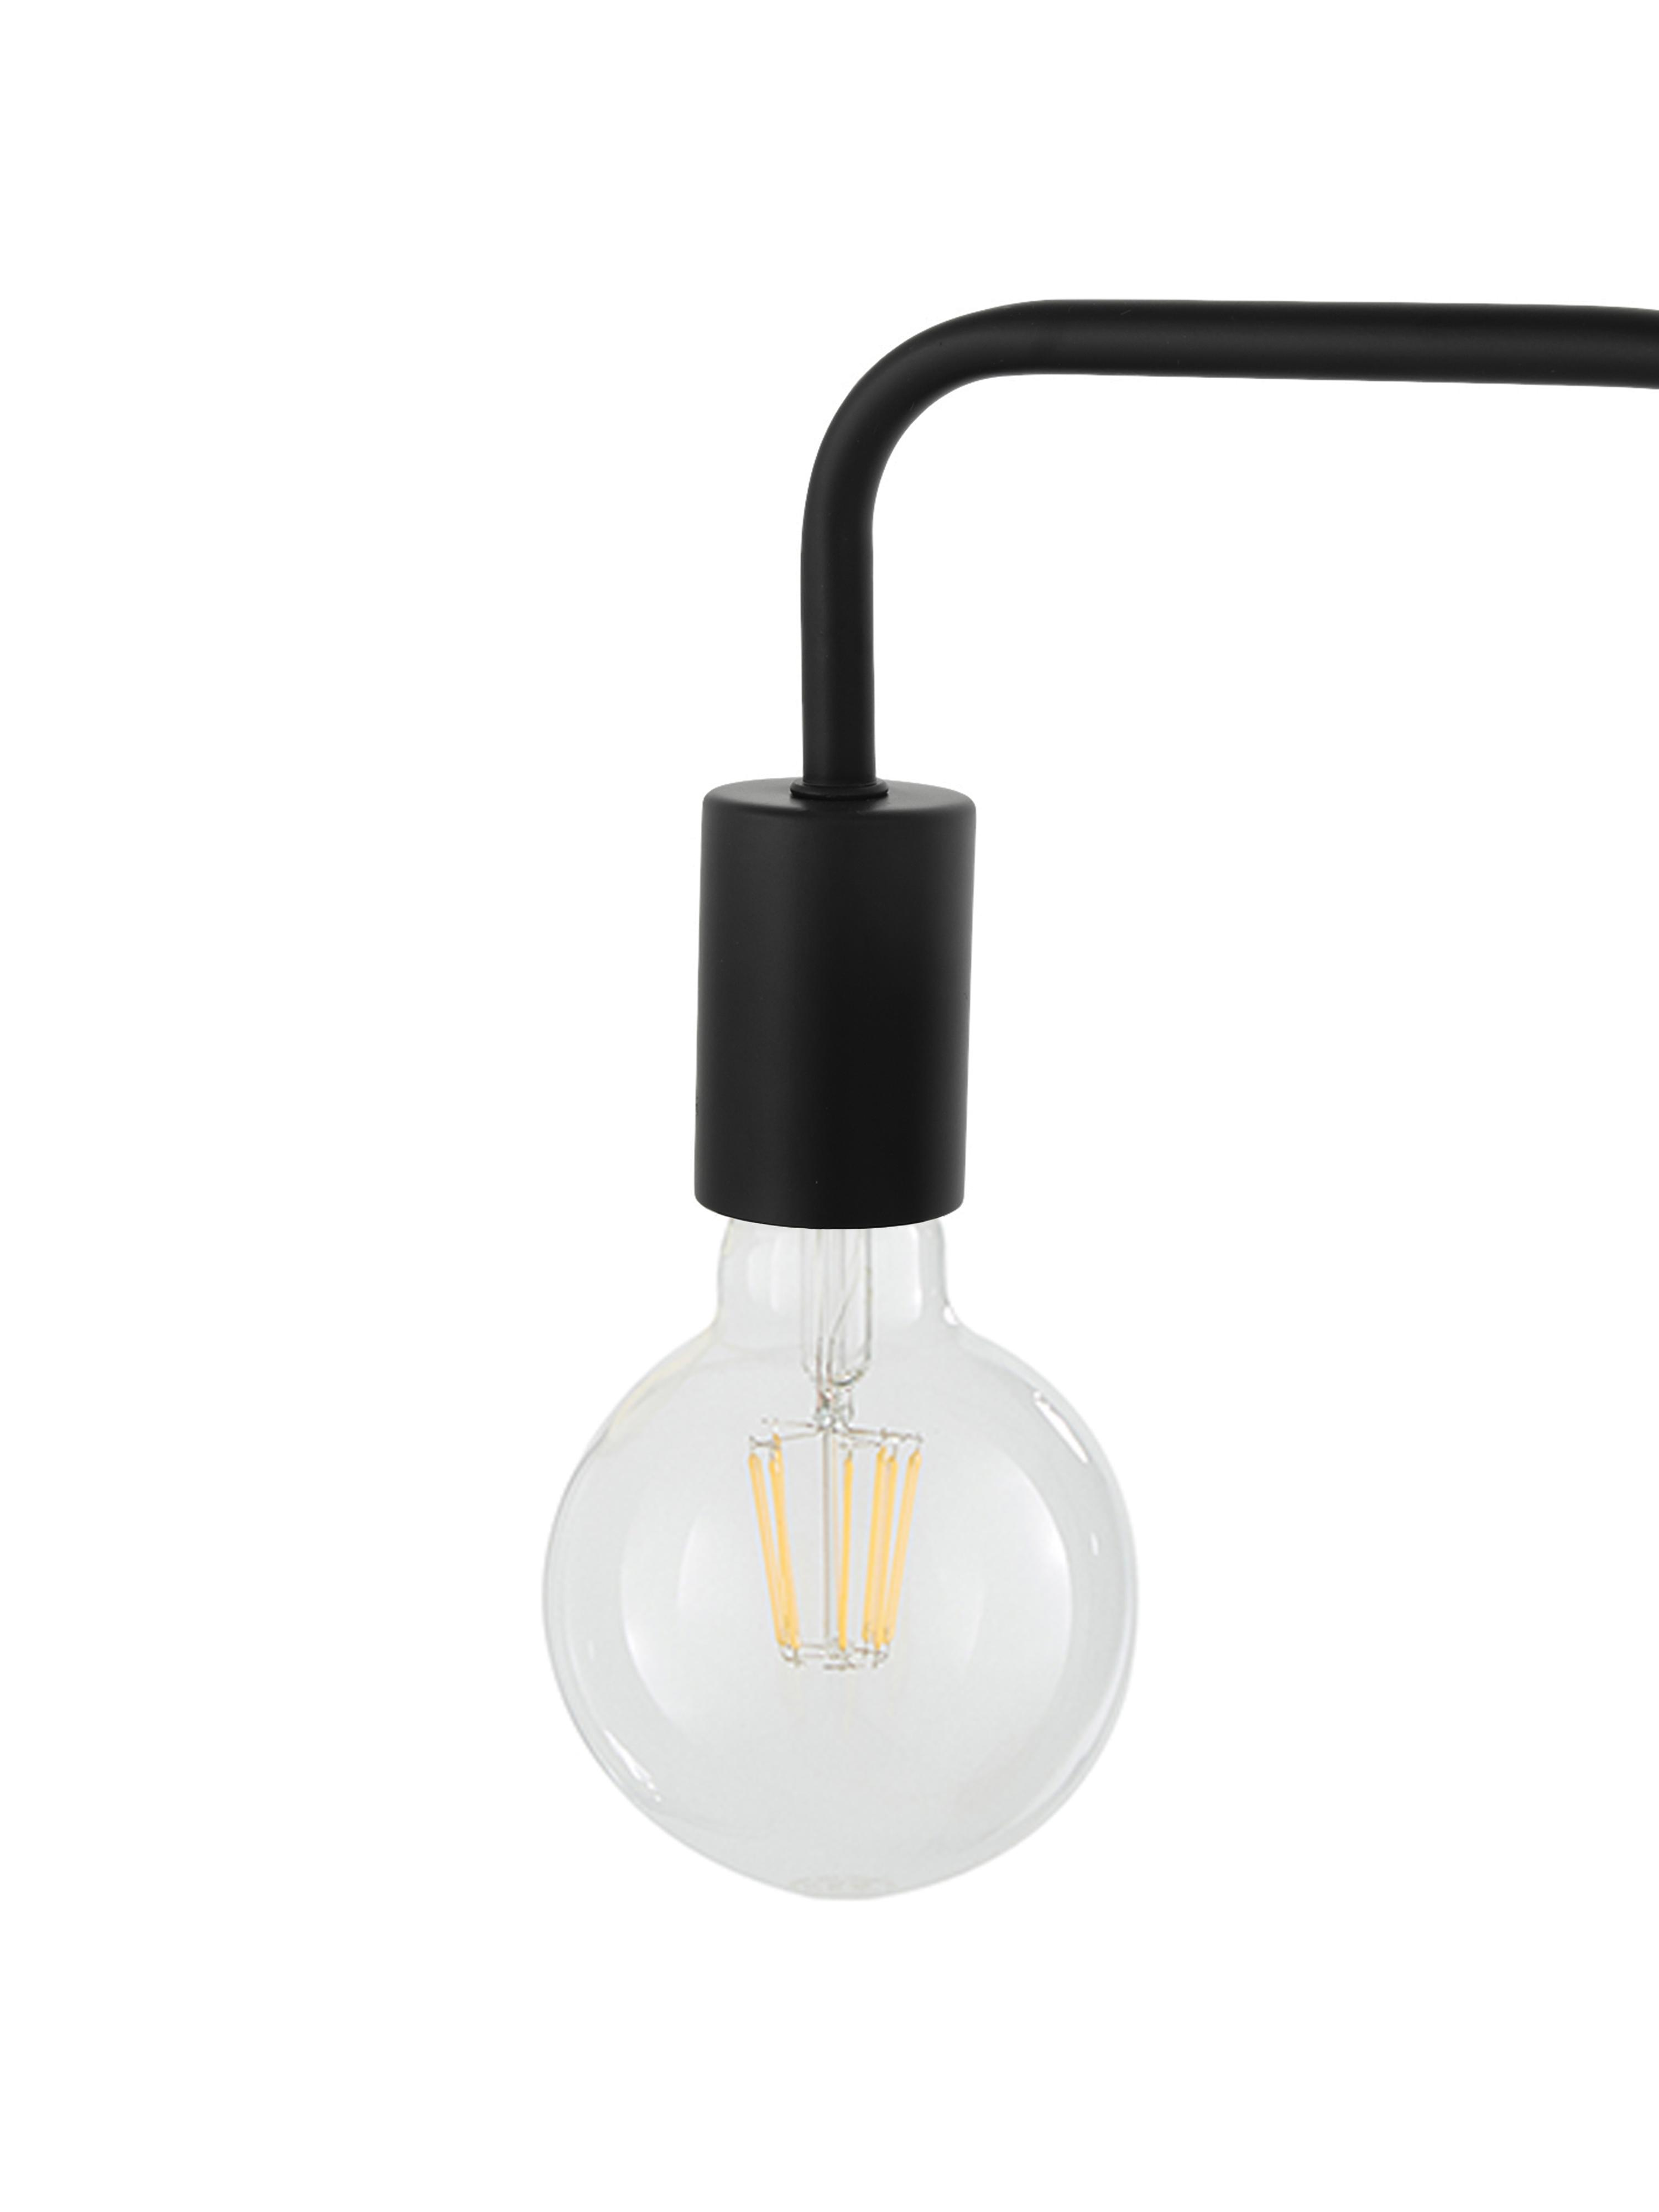 Tafellamp Flow, Zwart, 22 x 56 cm